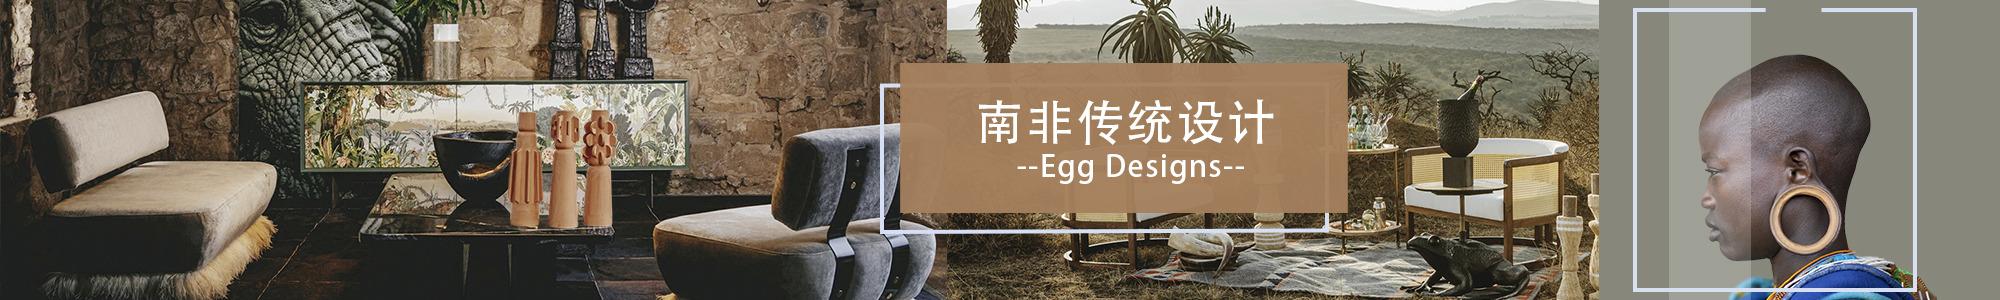 Egg Designs 南非传统设计